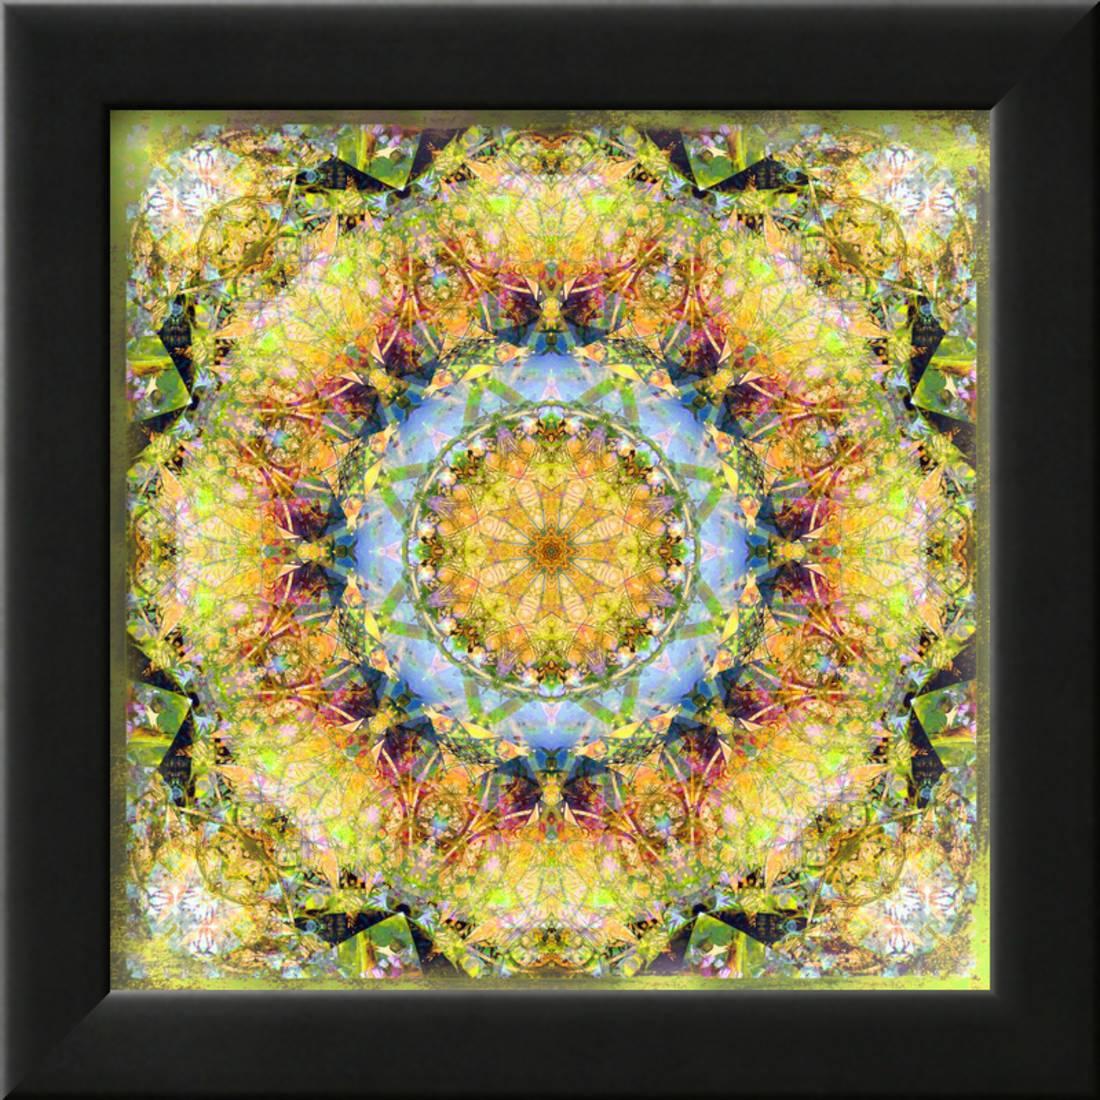 Energy Sun Framed Print Wall Art By Alaya Gadeh - Walmart.com